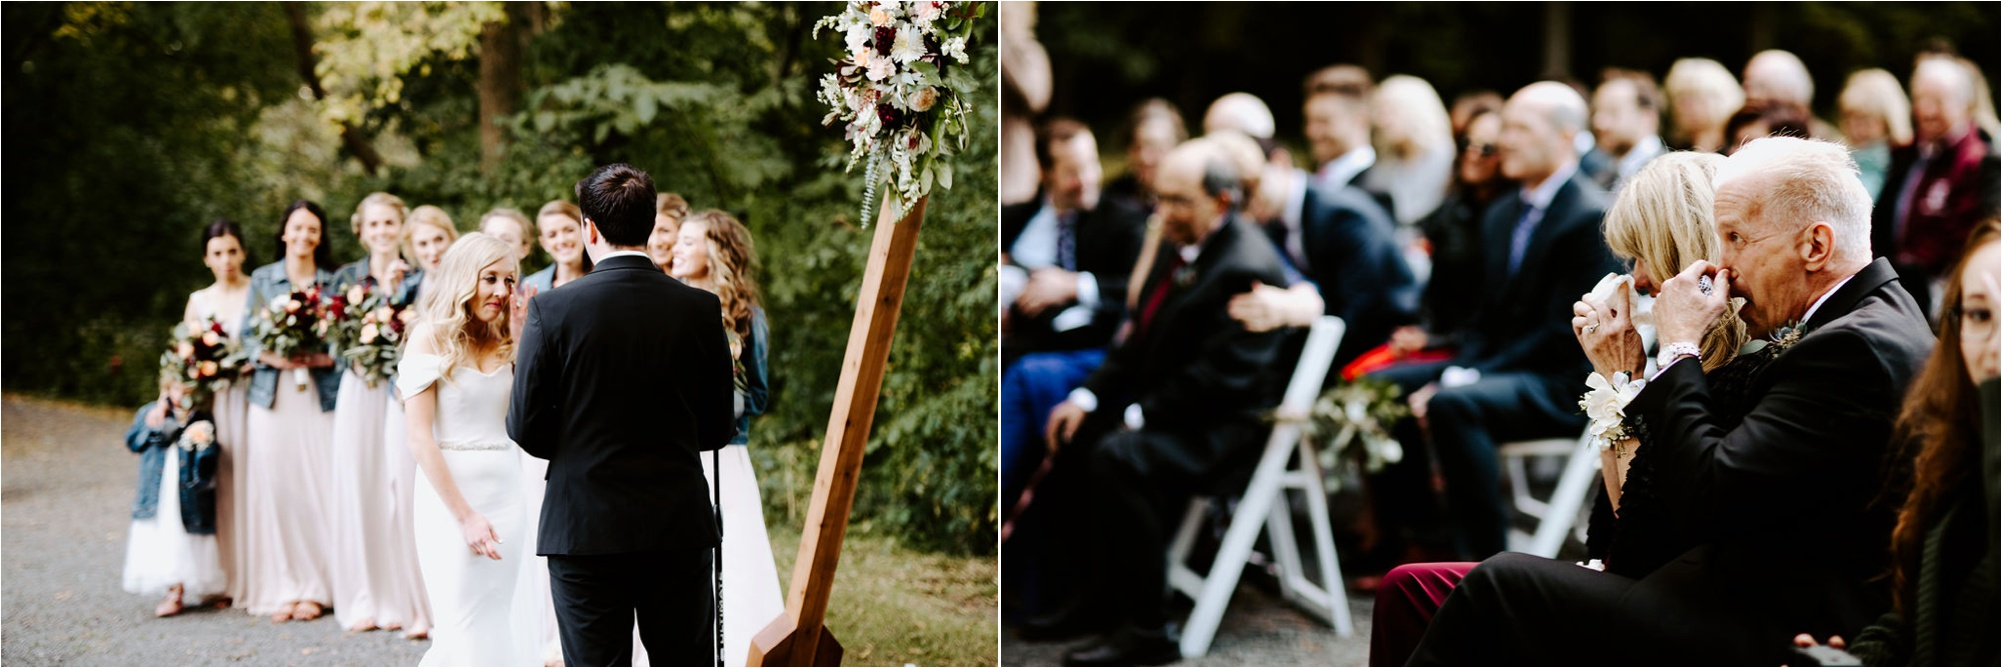 Winehaven Taylor's Falls Fall Wedding Minnesota Photographer_3882.jpg